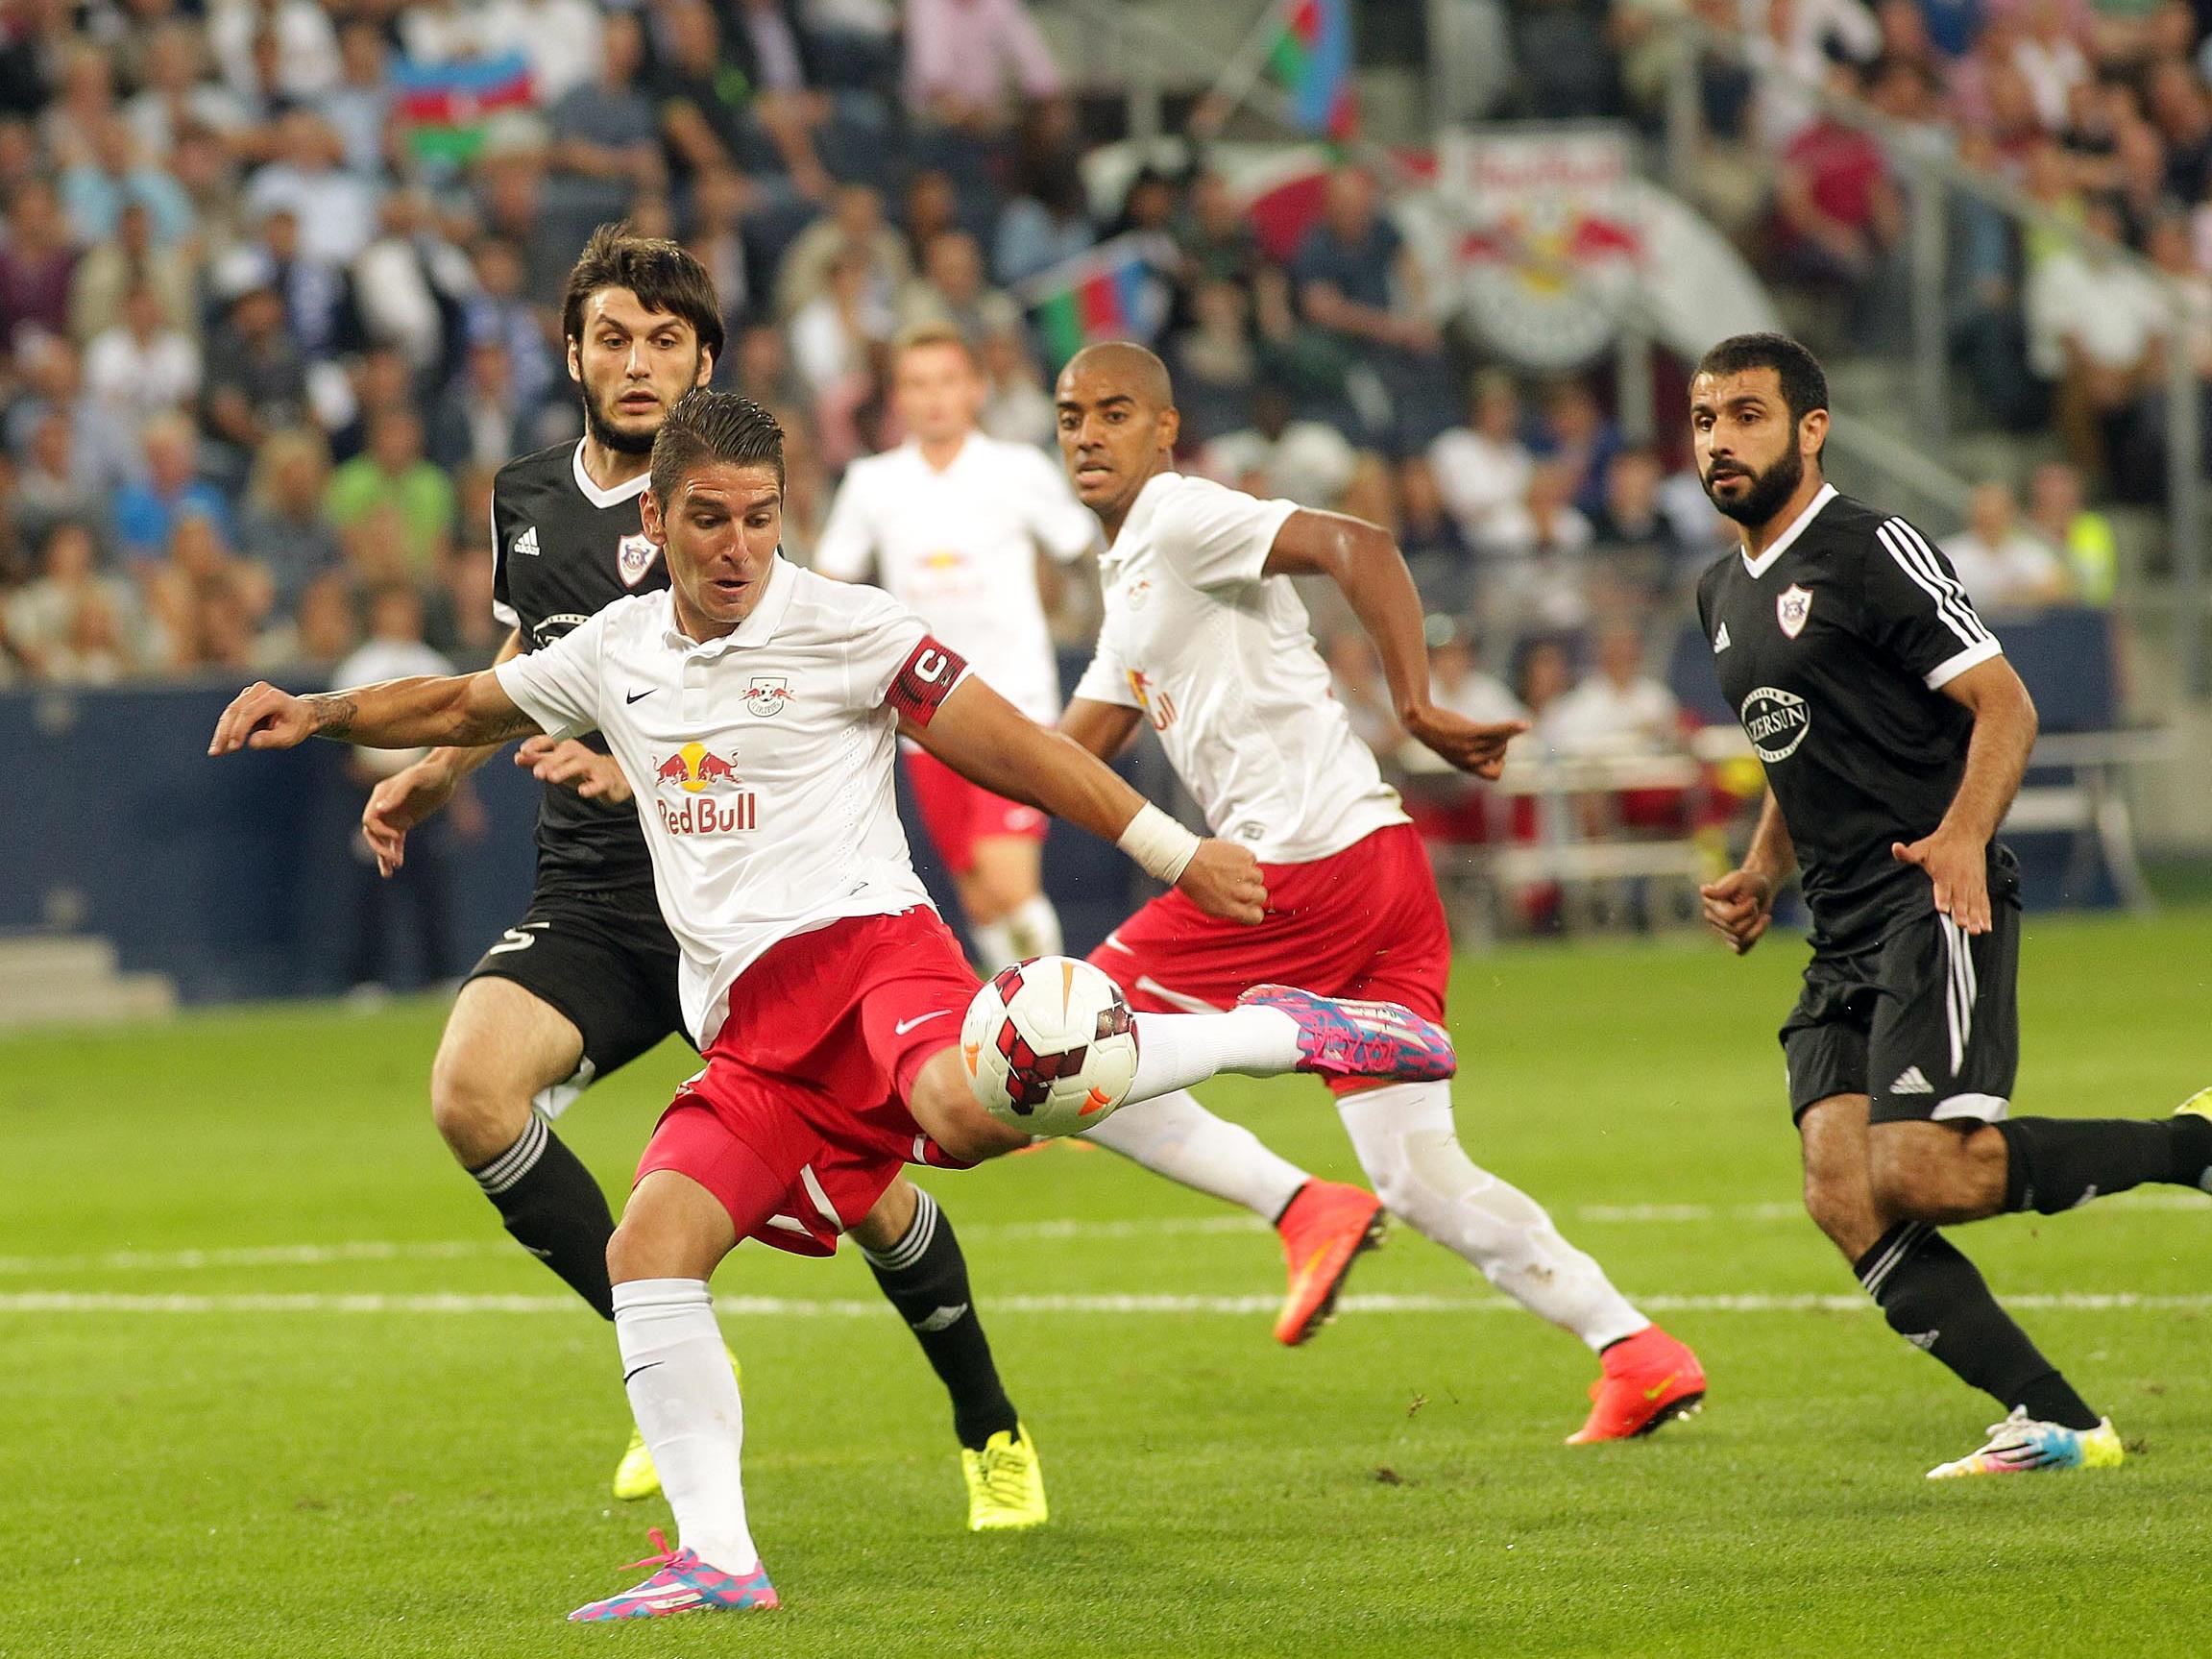 Red Bull Salzburg erreicht das Champions League-Play Off.